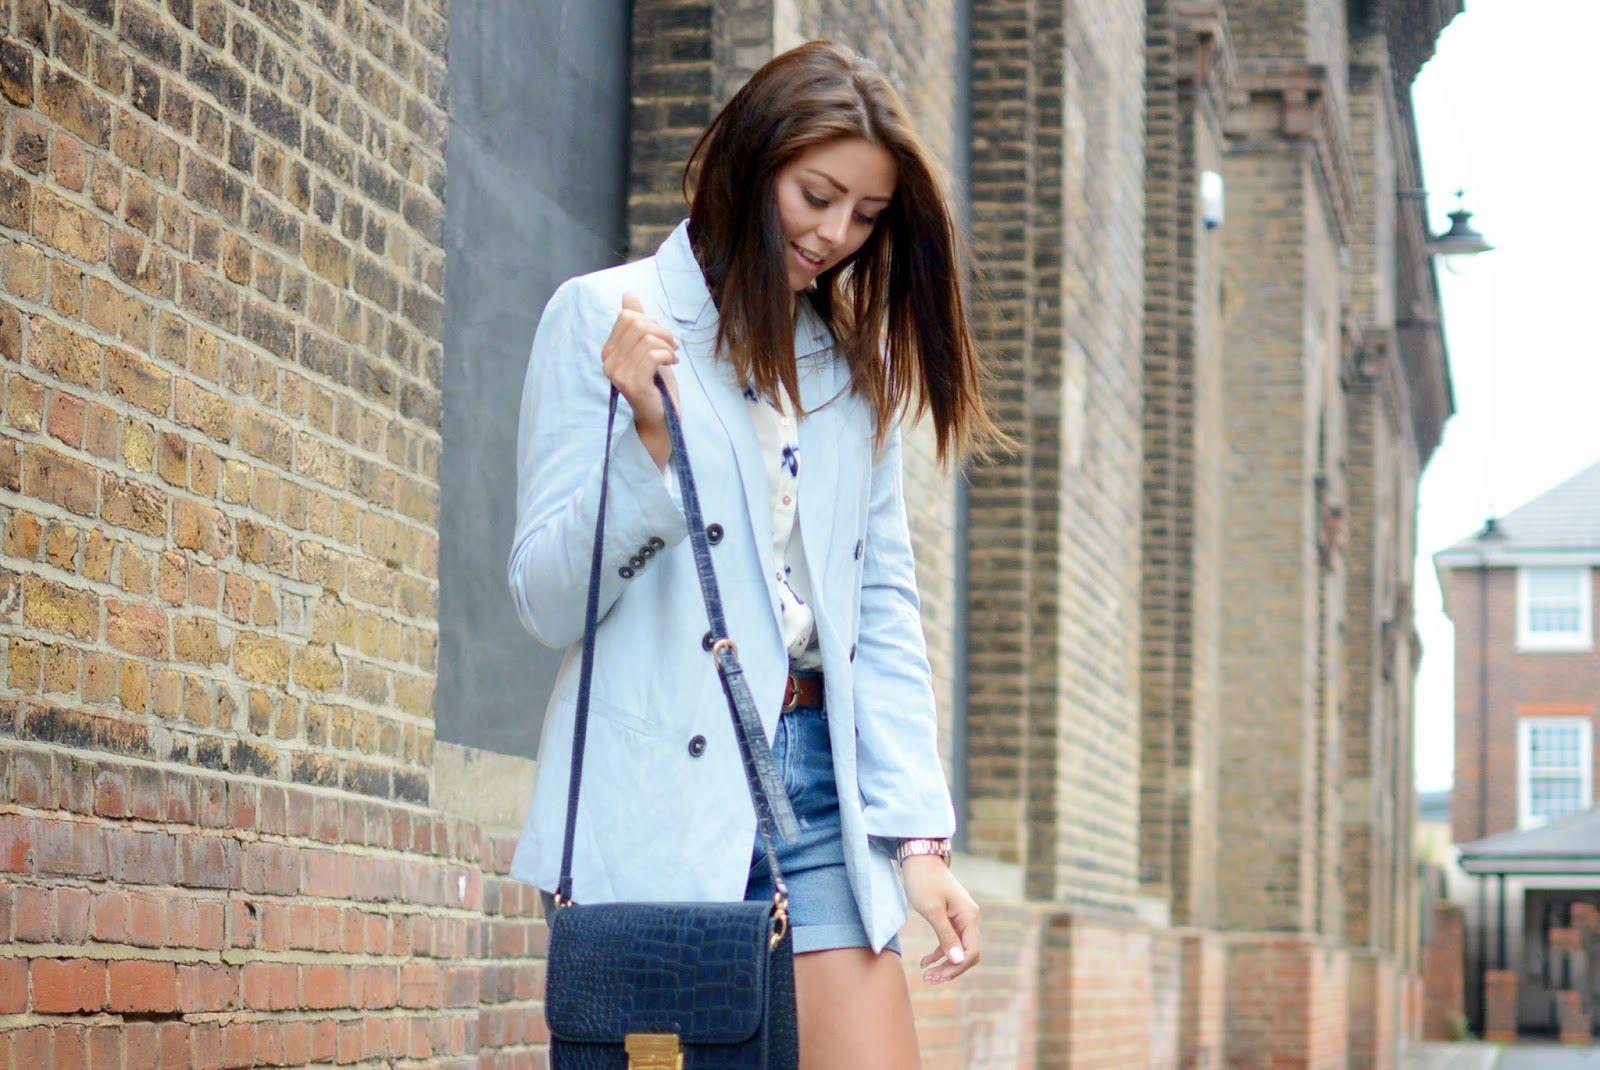 London Street Style pastel blue blazer, print shirt/blouse, denim shorts, navy bag, #fashion #blogger #ejstyle #summer #style